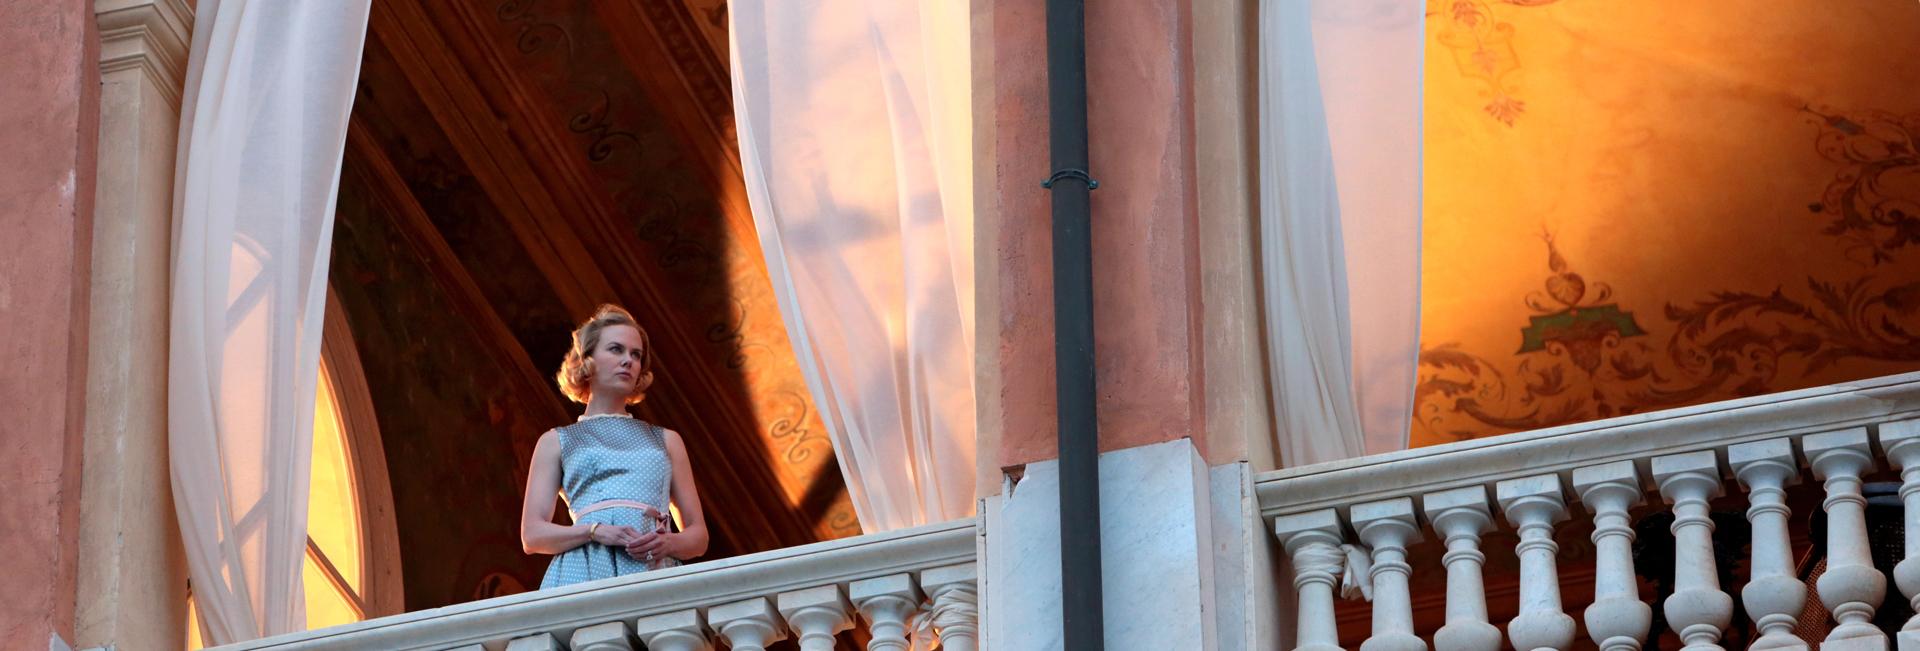 Grace-of-Monaco-film-movie-2014-Nicole-Kidman-Tim-Roth (1)